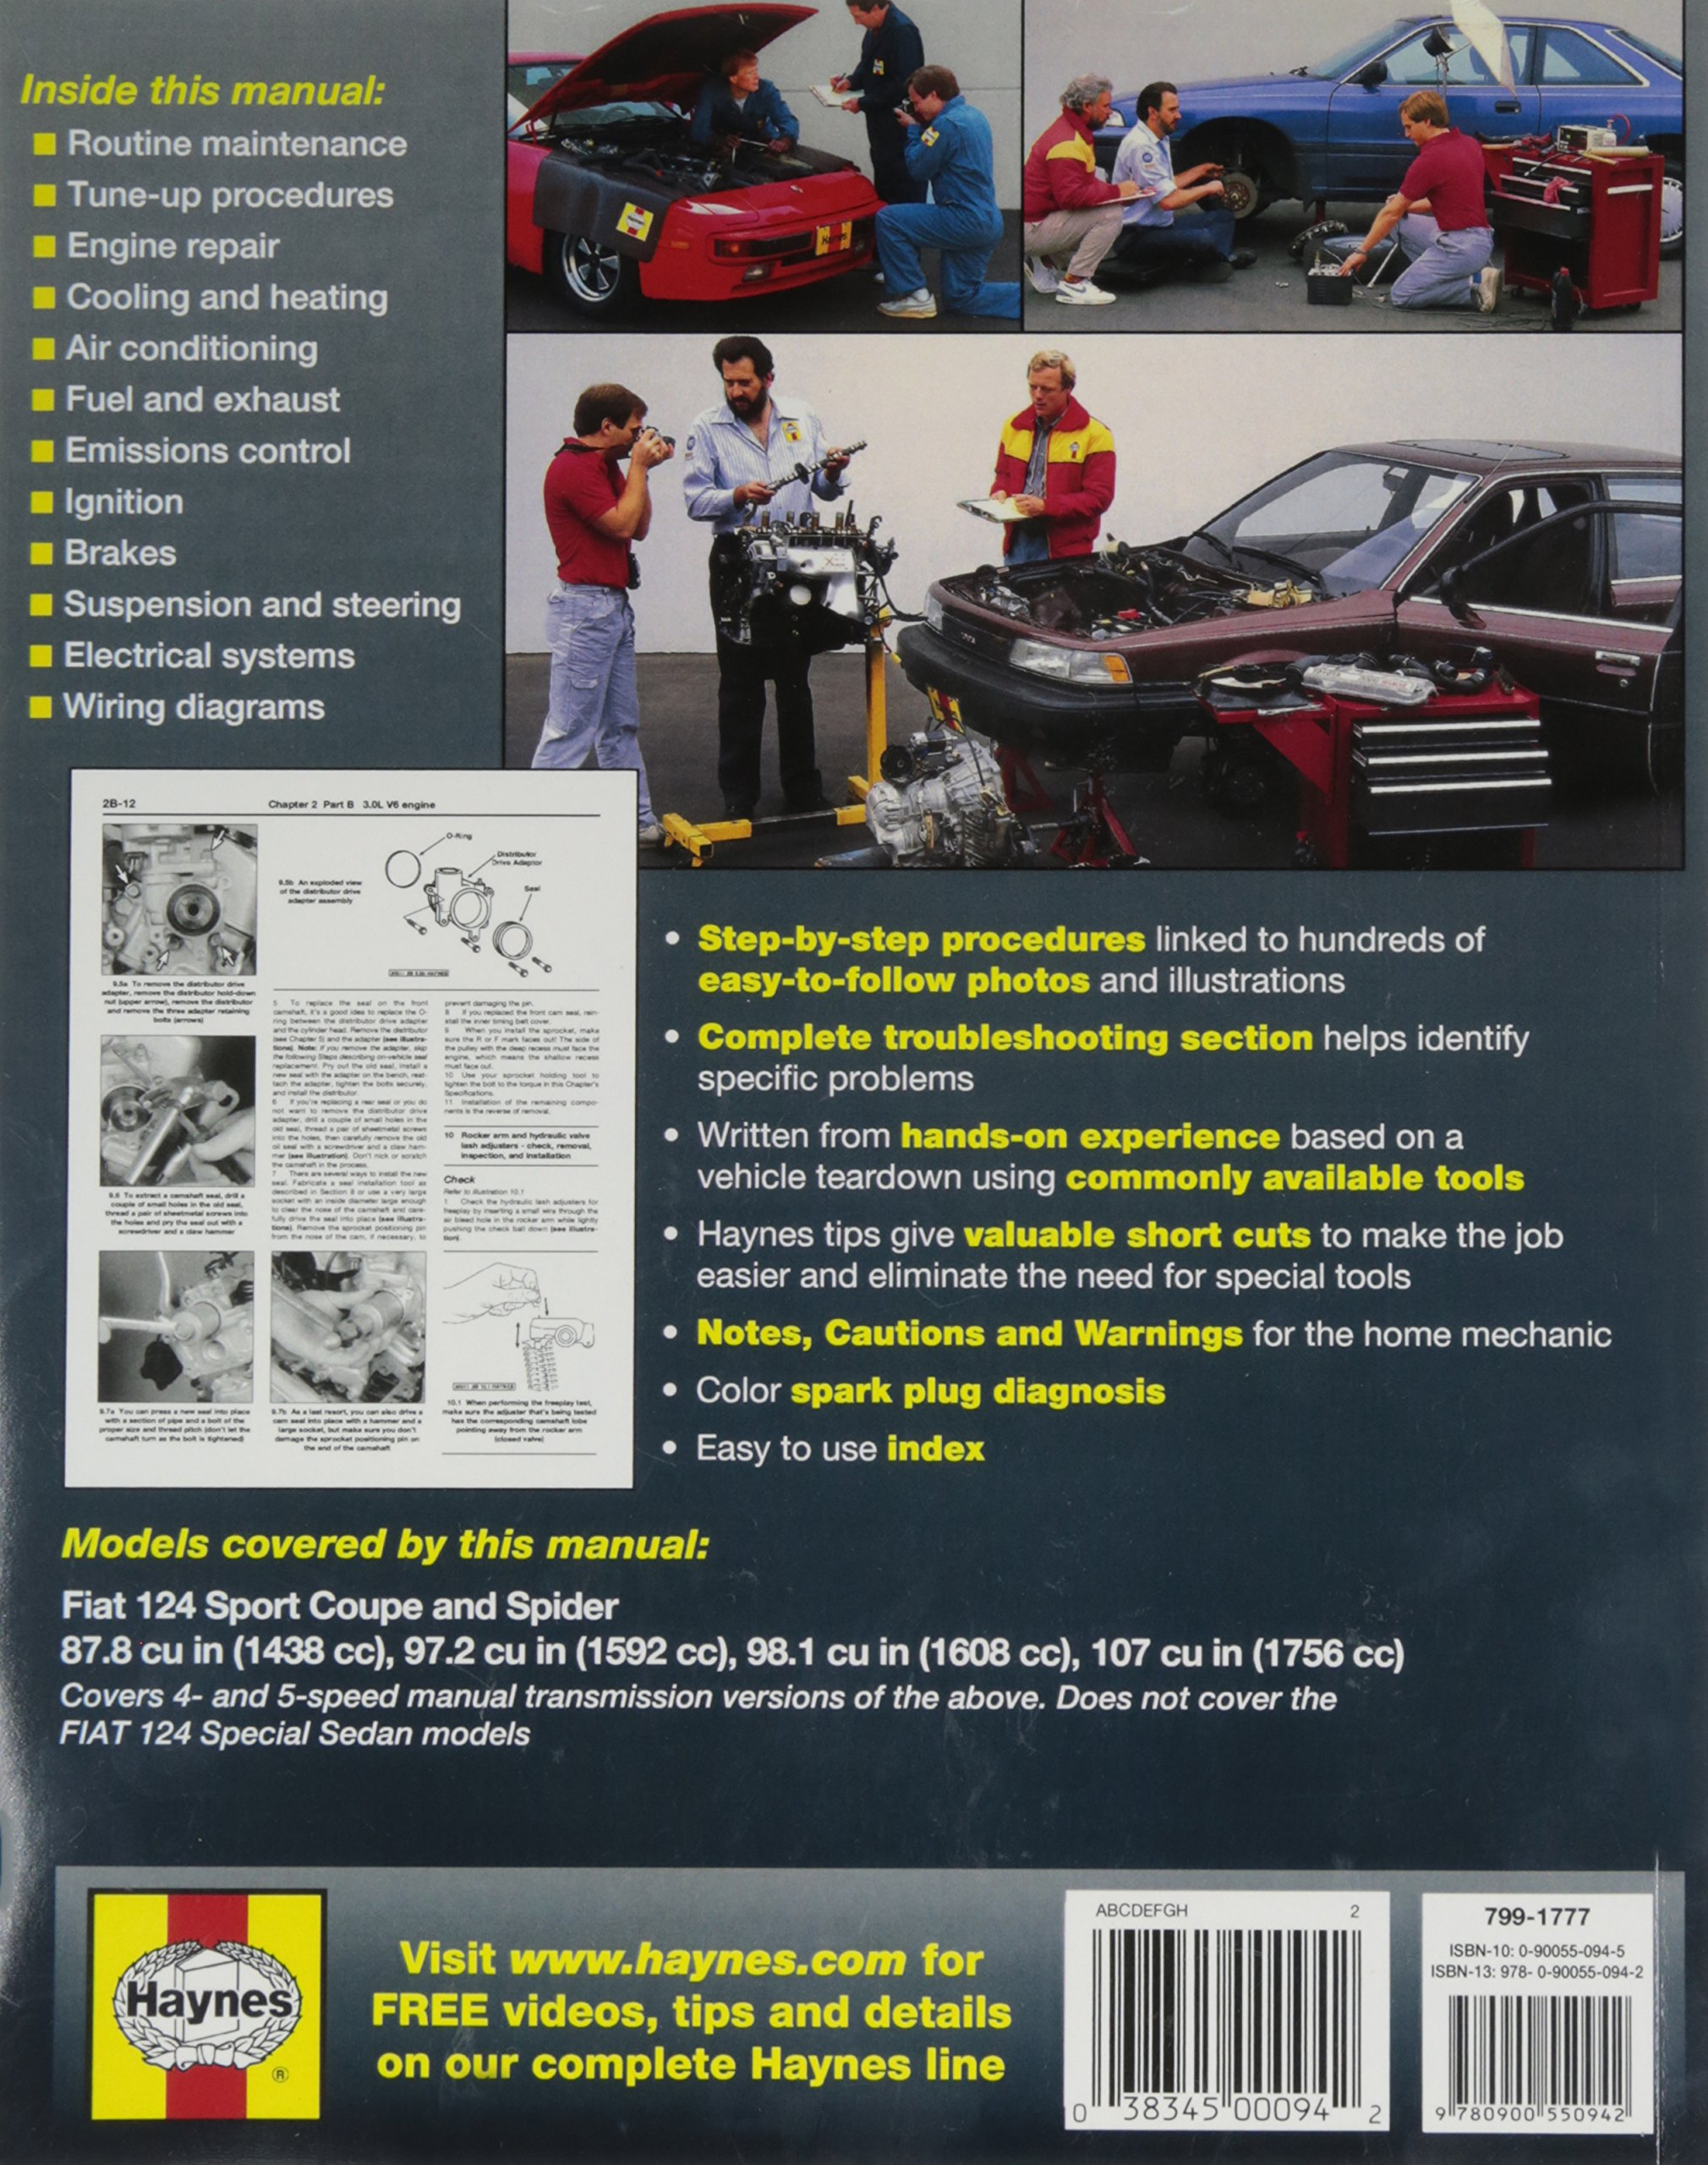 Haynes Publications Inc 34010 Repair Manual 0038345000942 Amazon Electric Motor Wiring Diagram Car Tuning Books